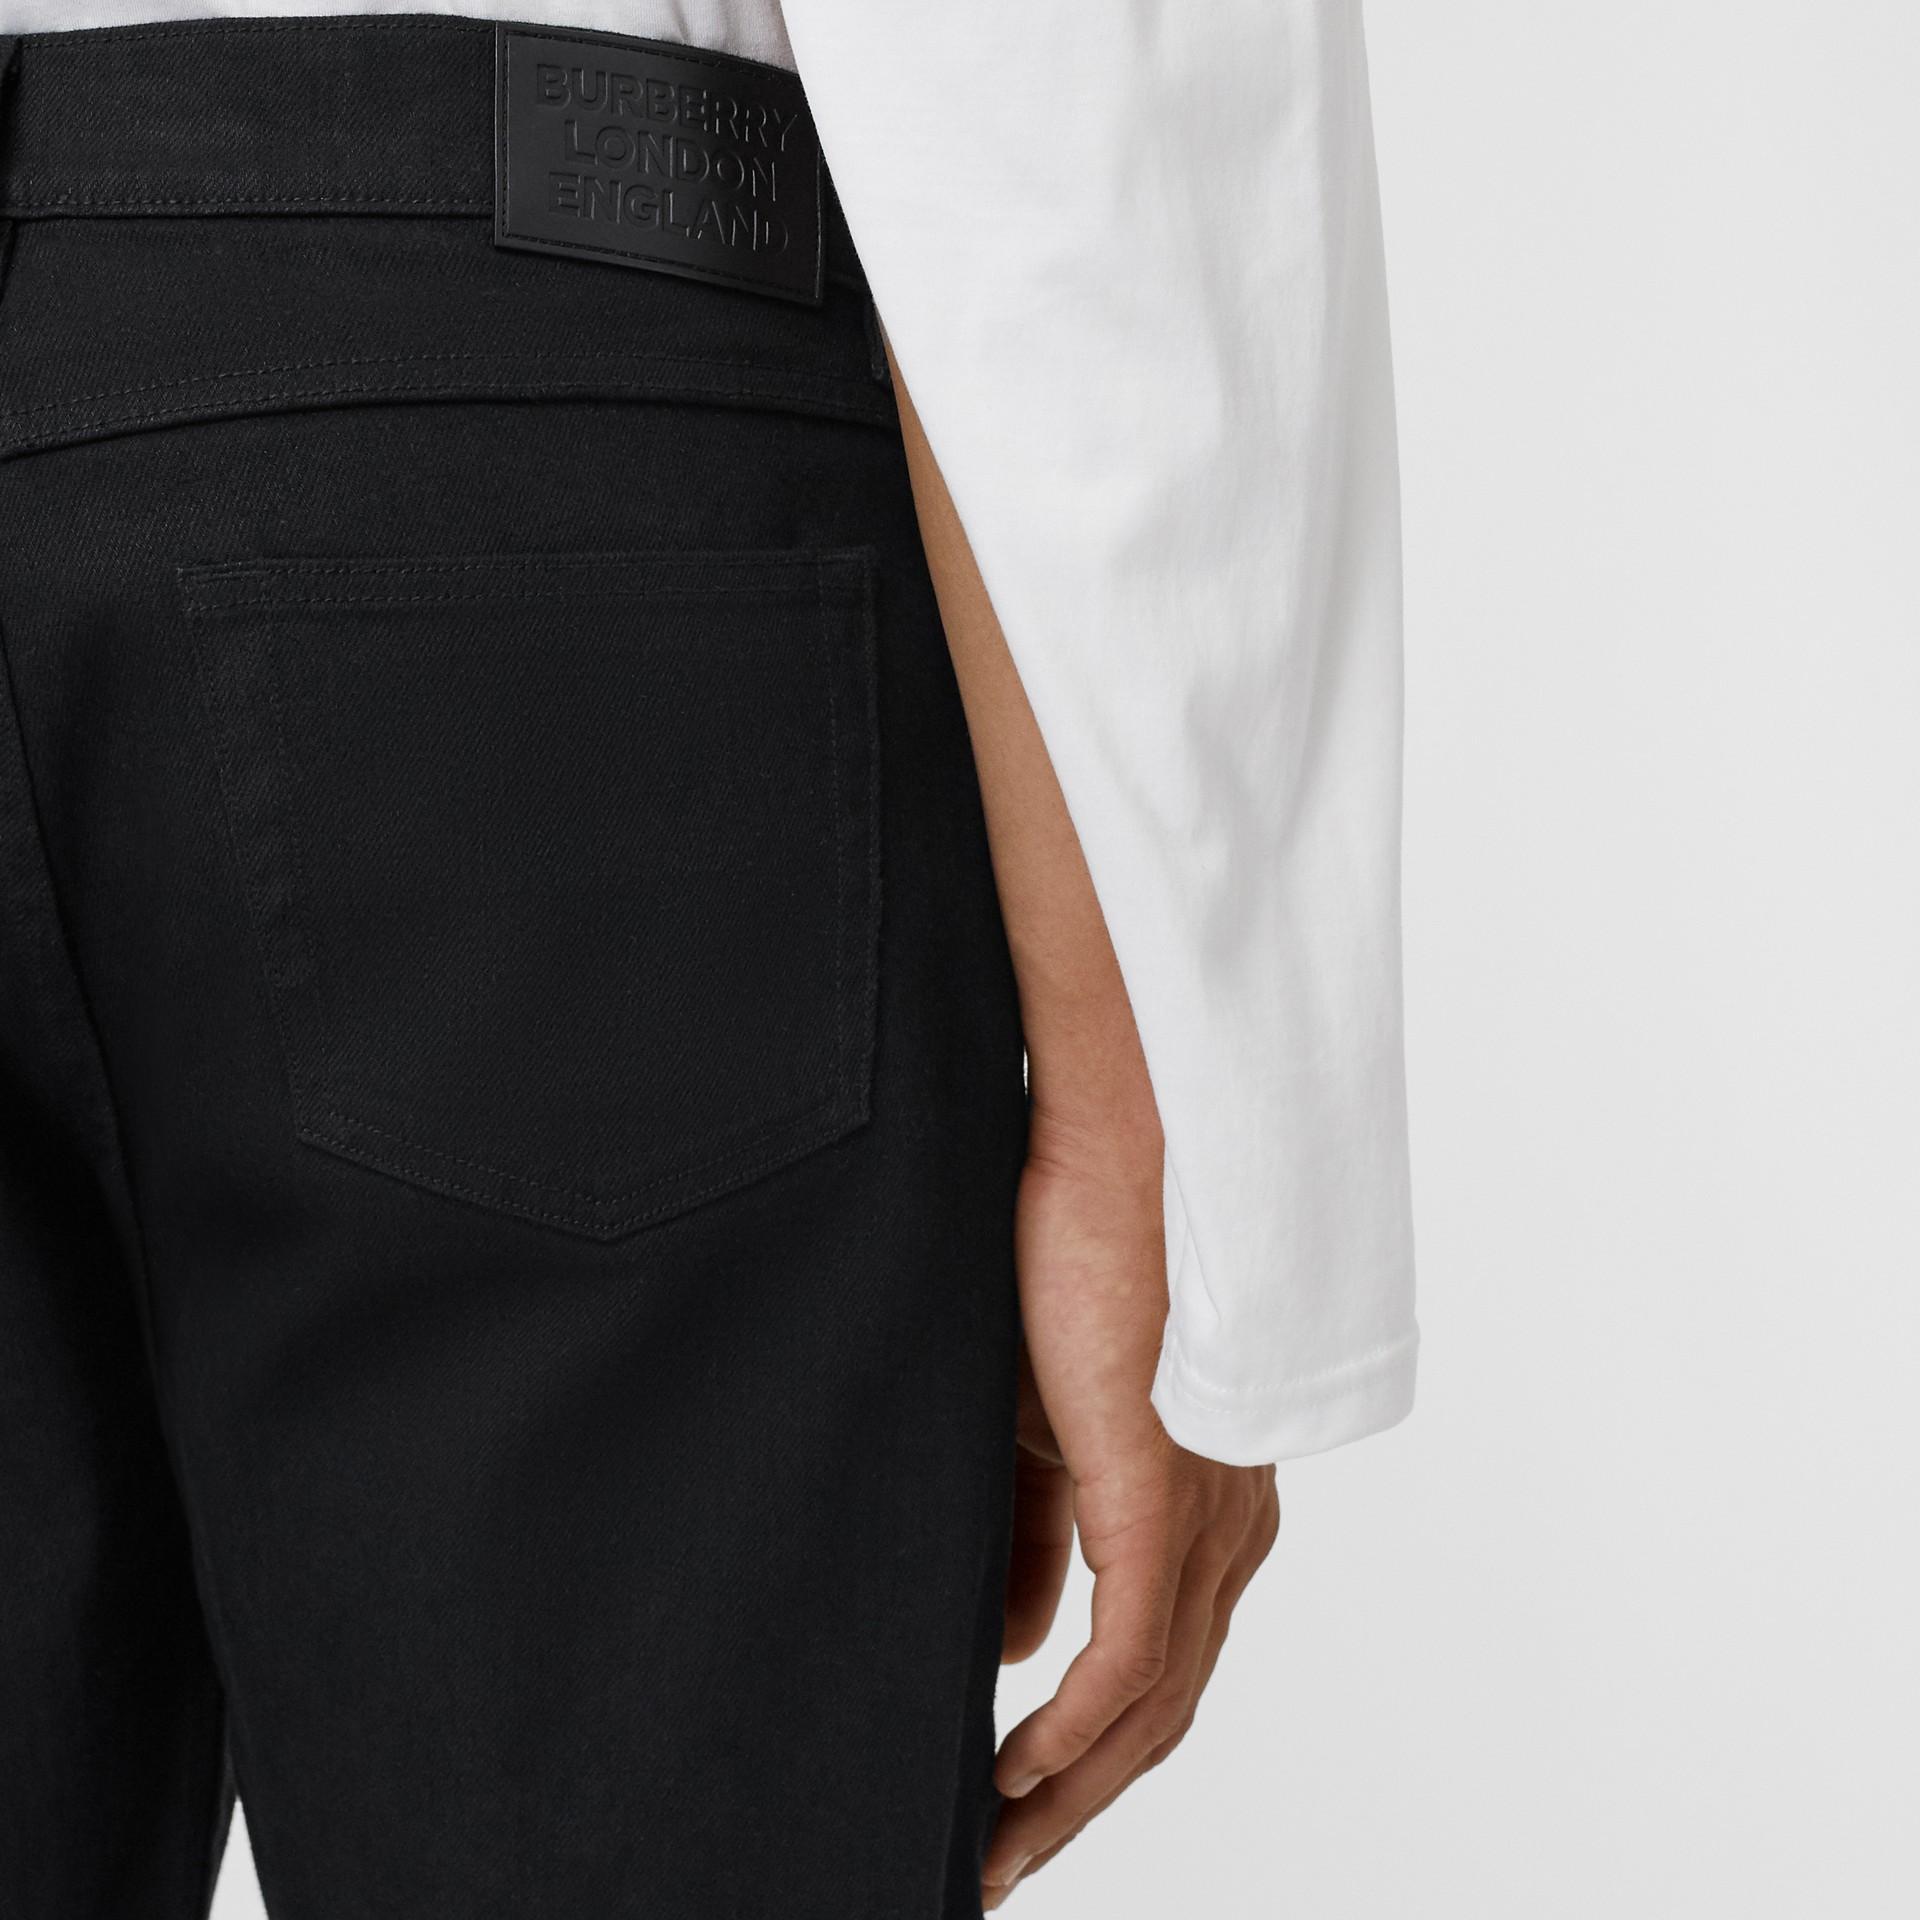 Slim Fit Japanese Denim Jeans in Black - Men | Burberry - gallery image 1